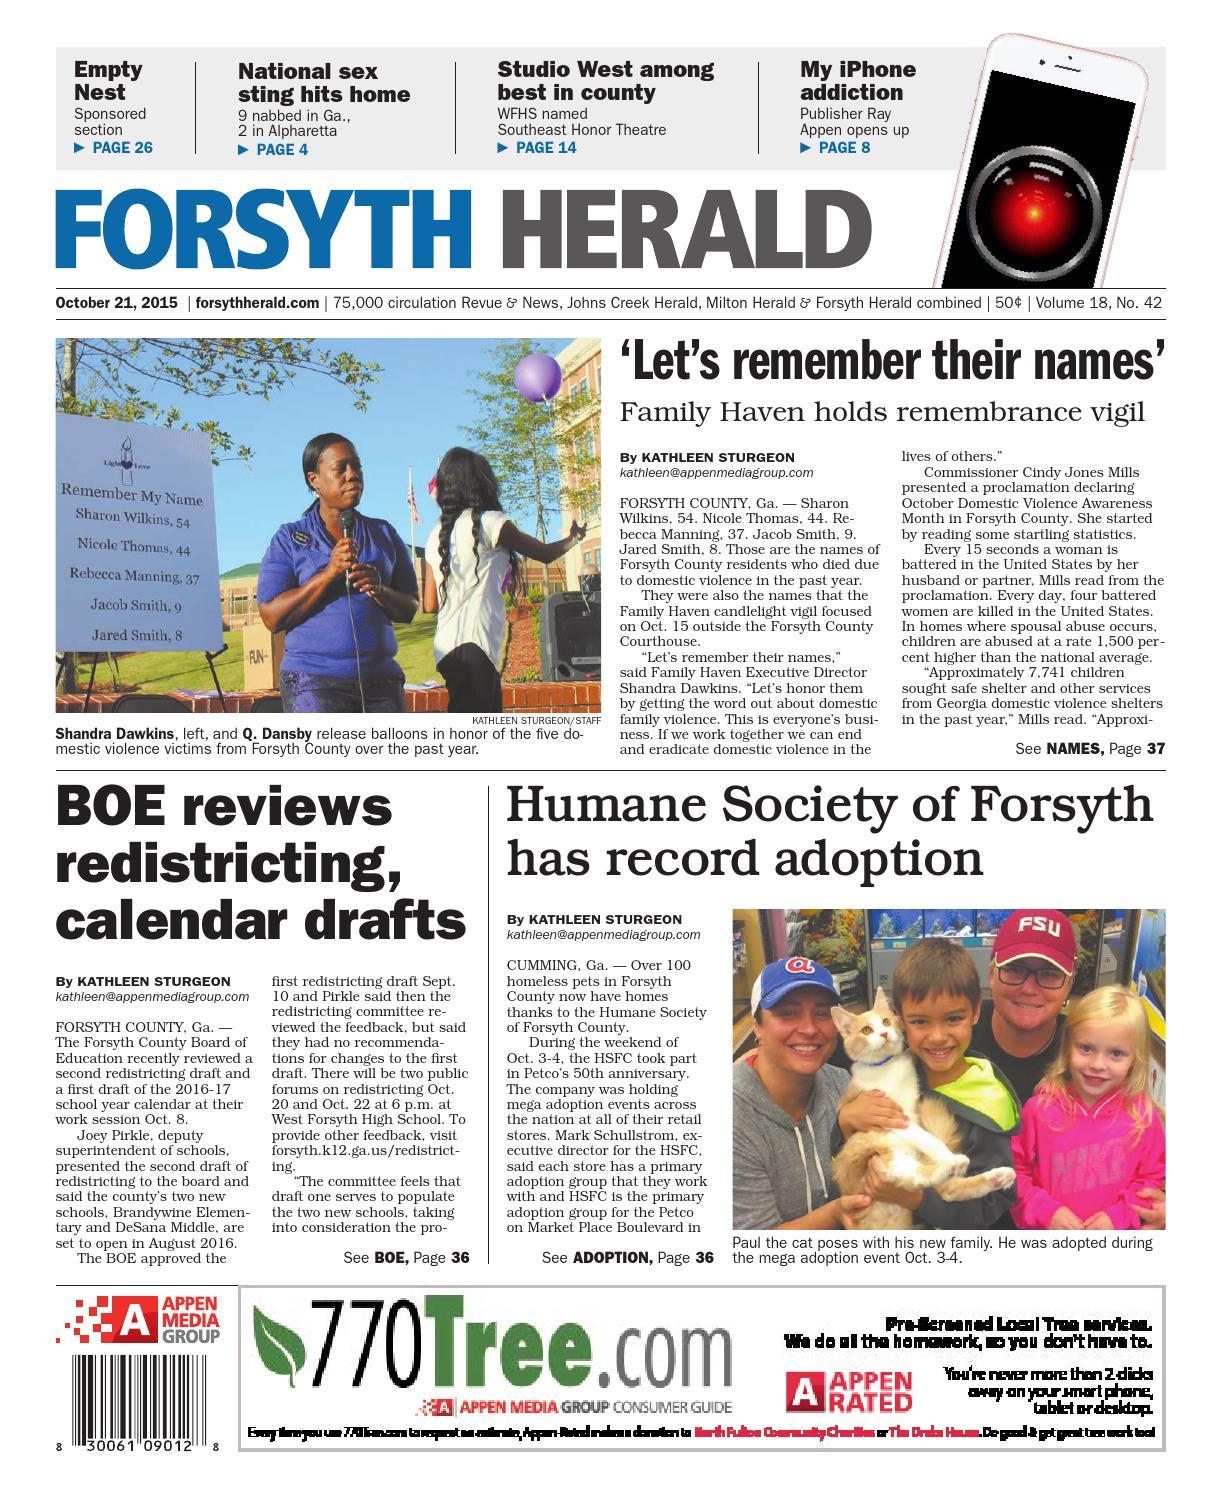 Forsyth Herald, October 21, 2015 by Appen Media Group - issuu